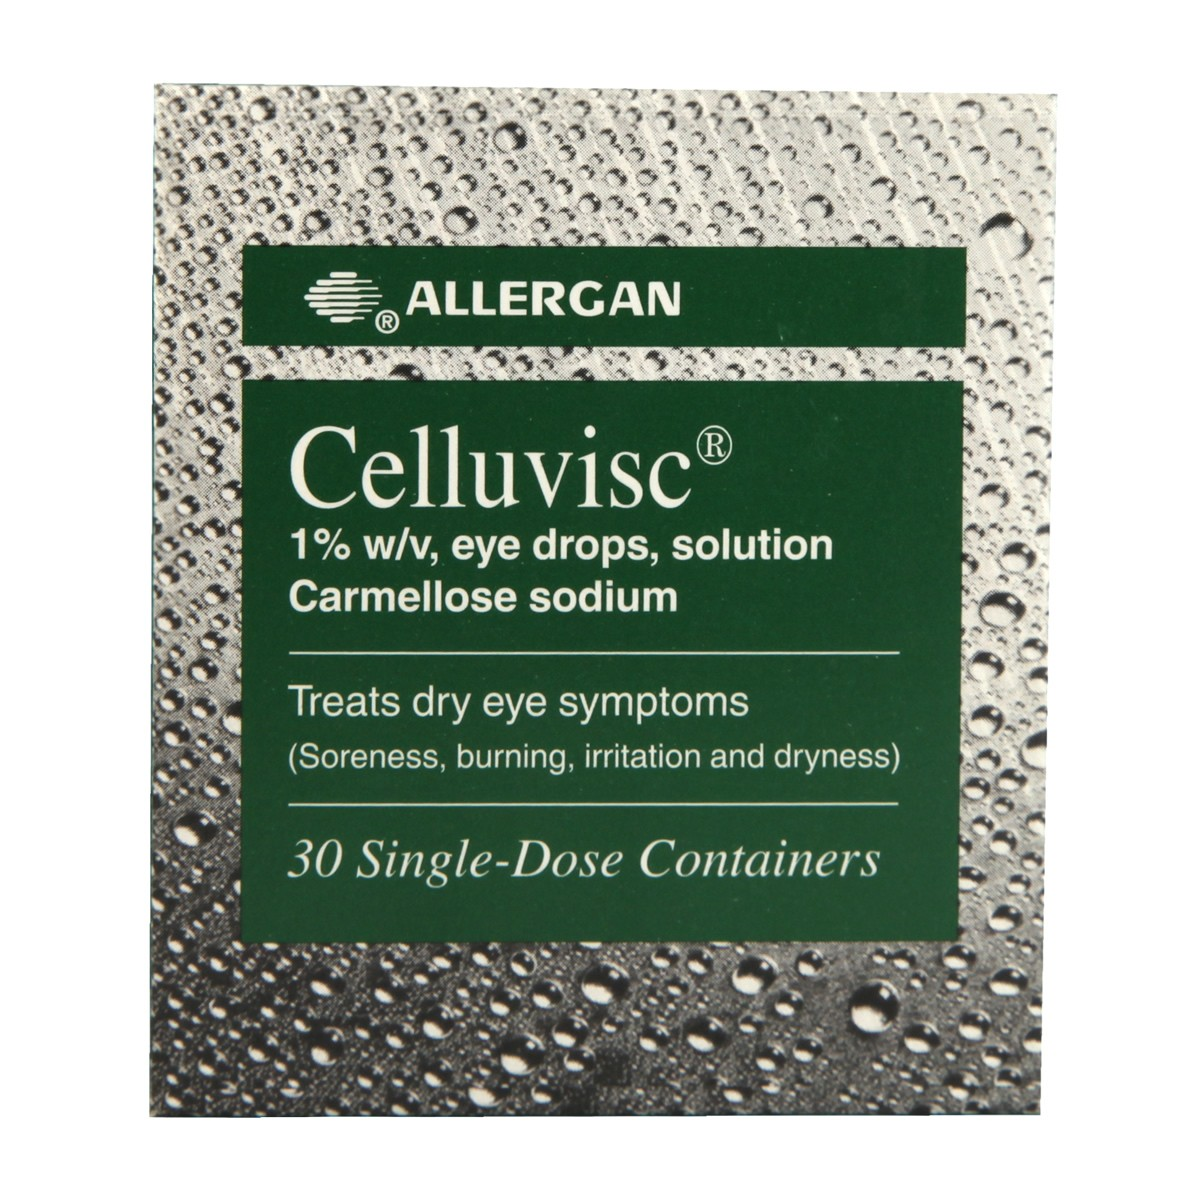 Allergan Celluvisc 1% w/v eye drops